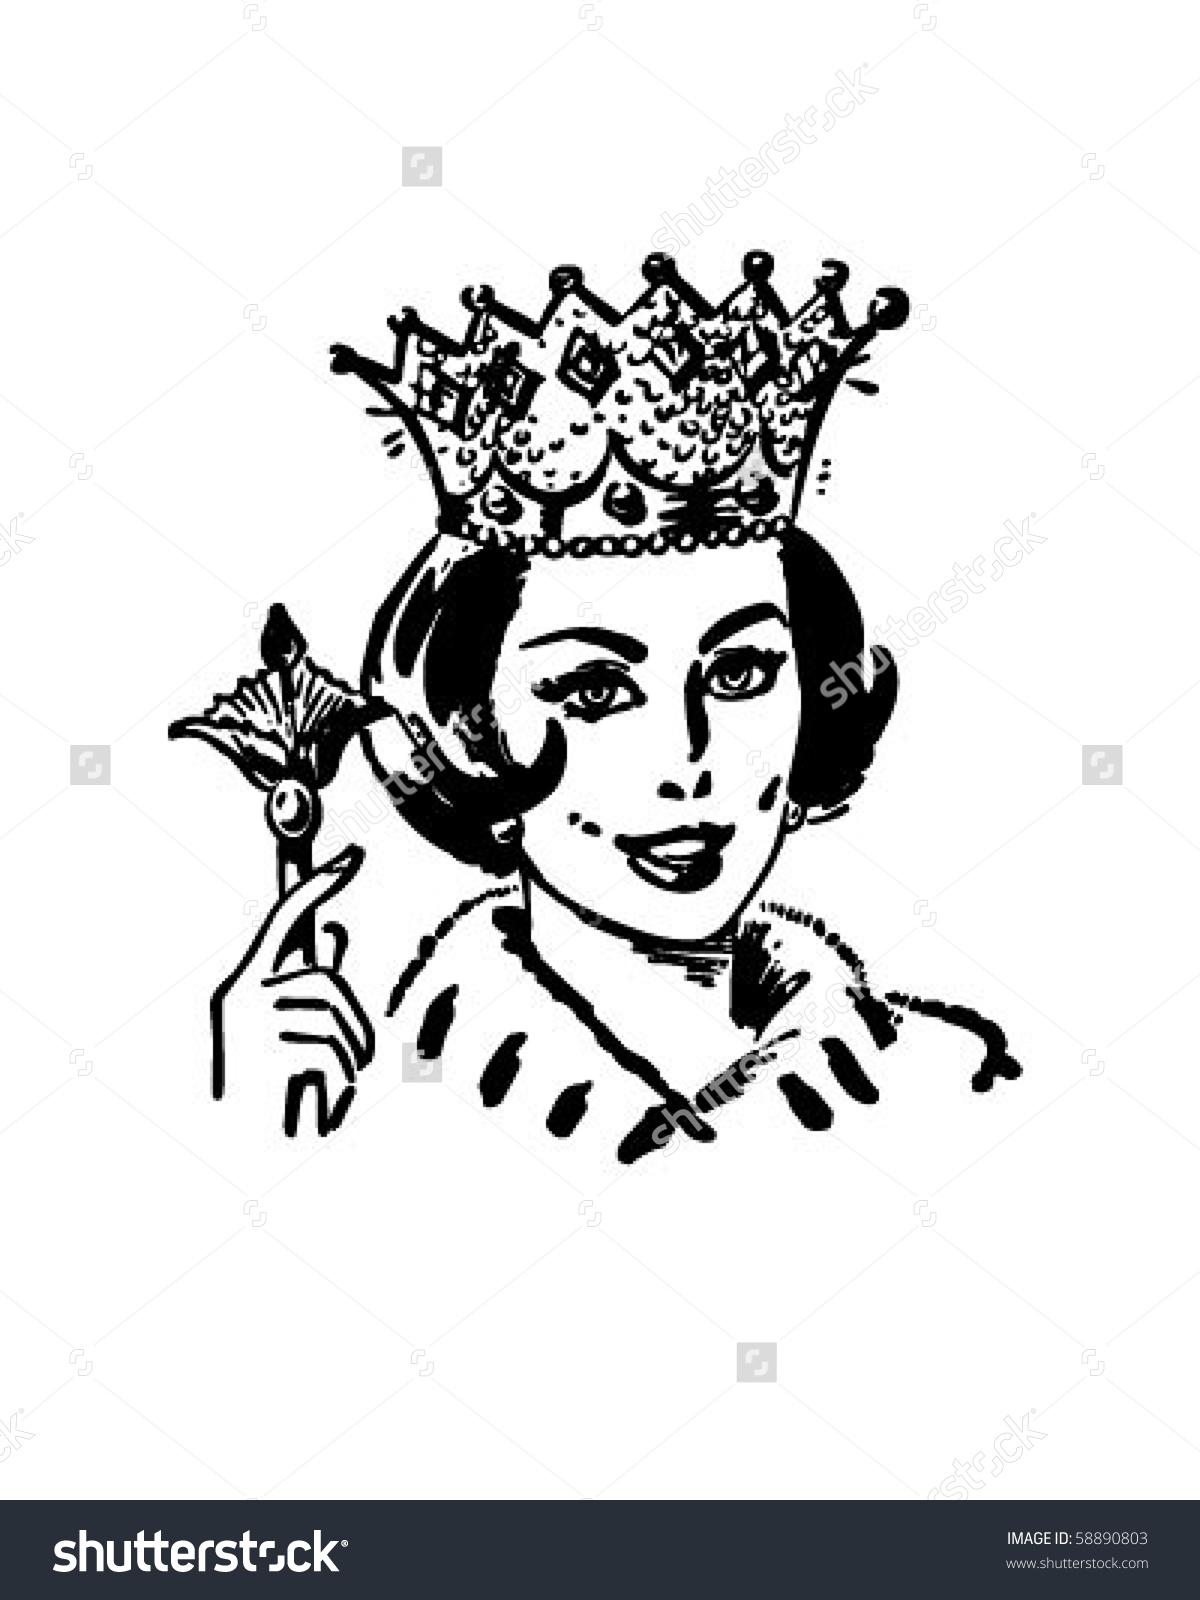 Monochrome clipart queen #12